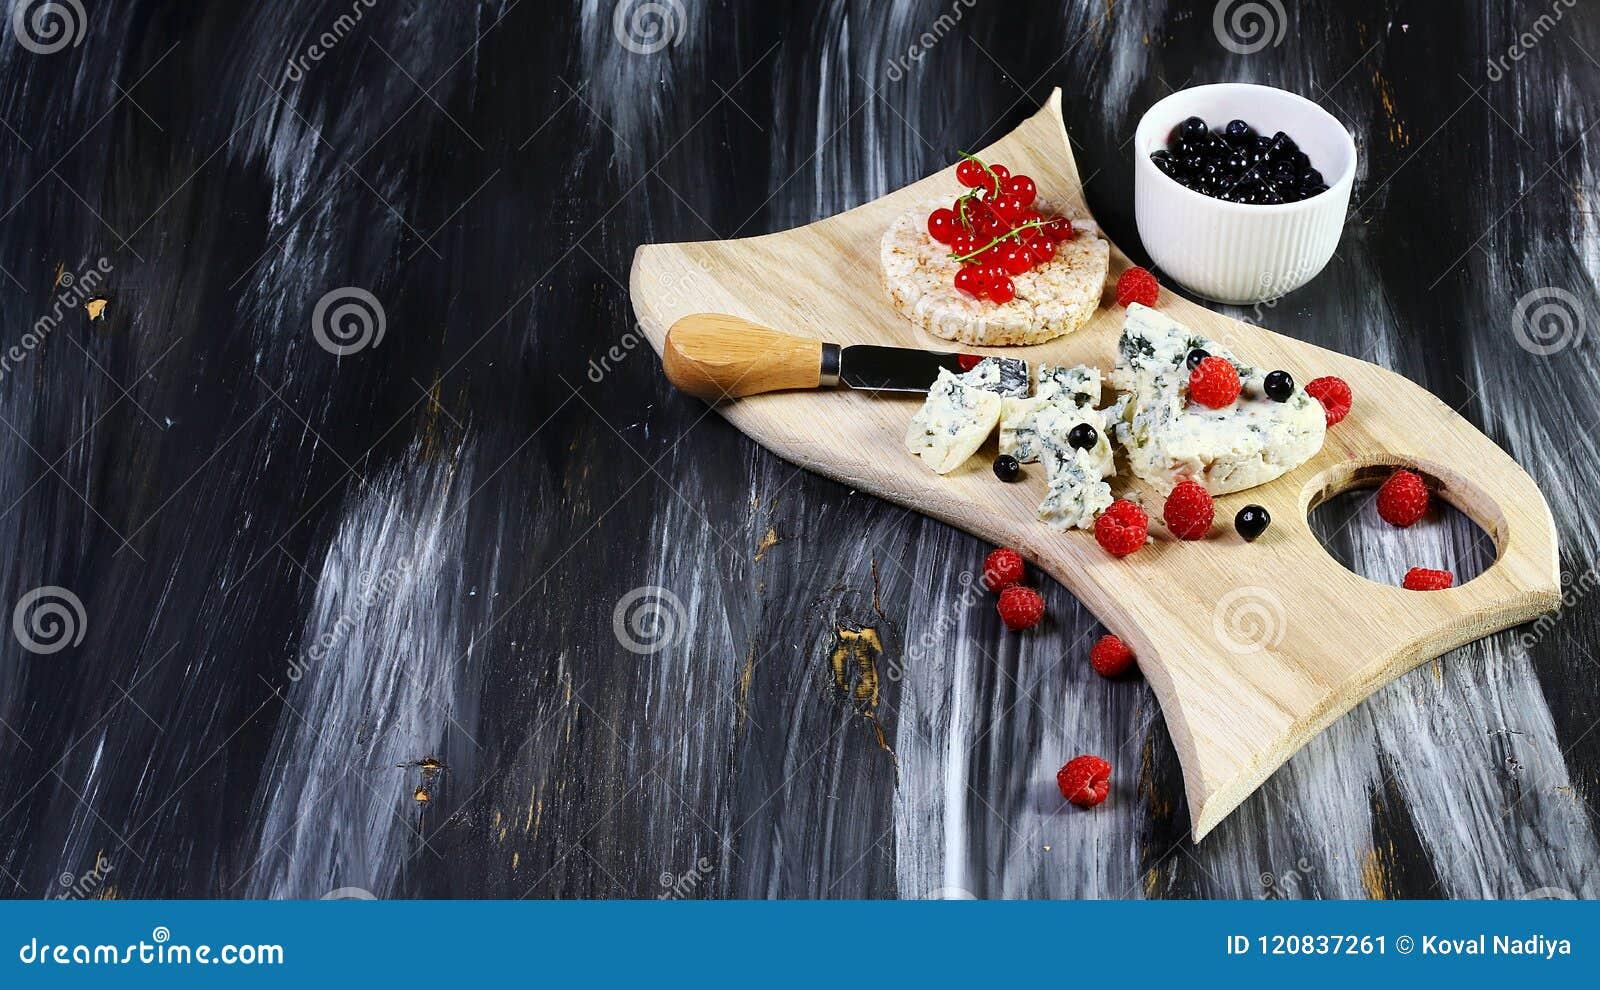 Provando o queijo do molde com frutos e as framboesas frescas das bagas, mirtilos no fundo de pedra do preto escuro